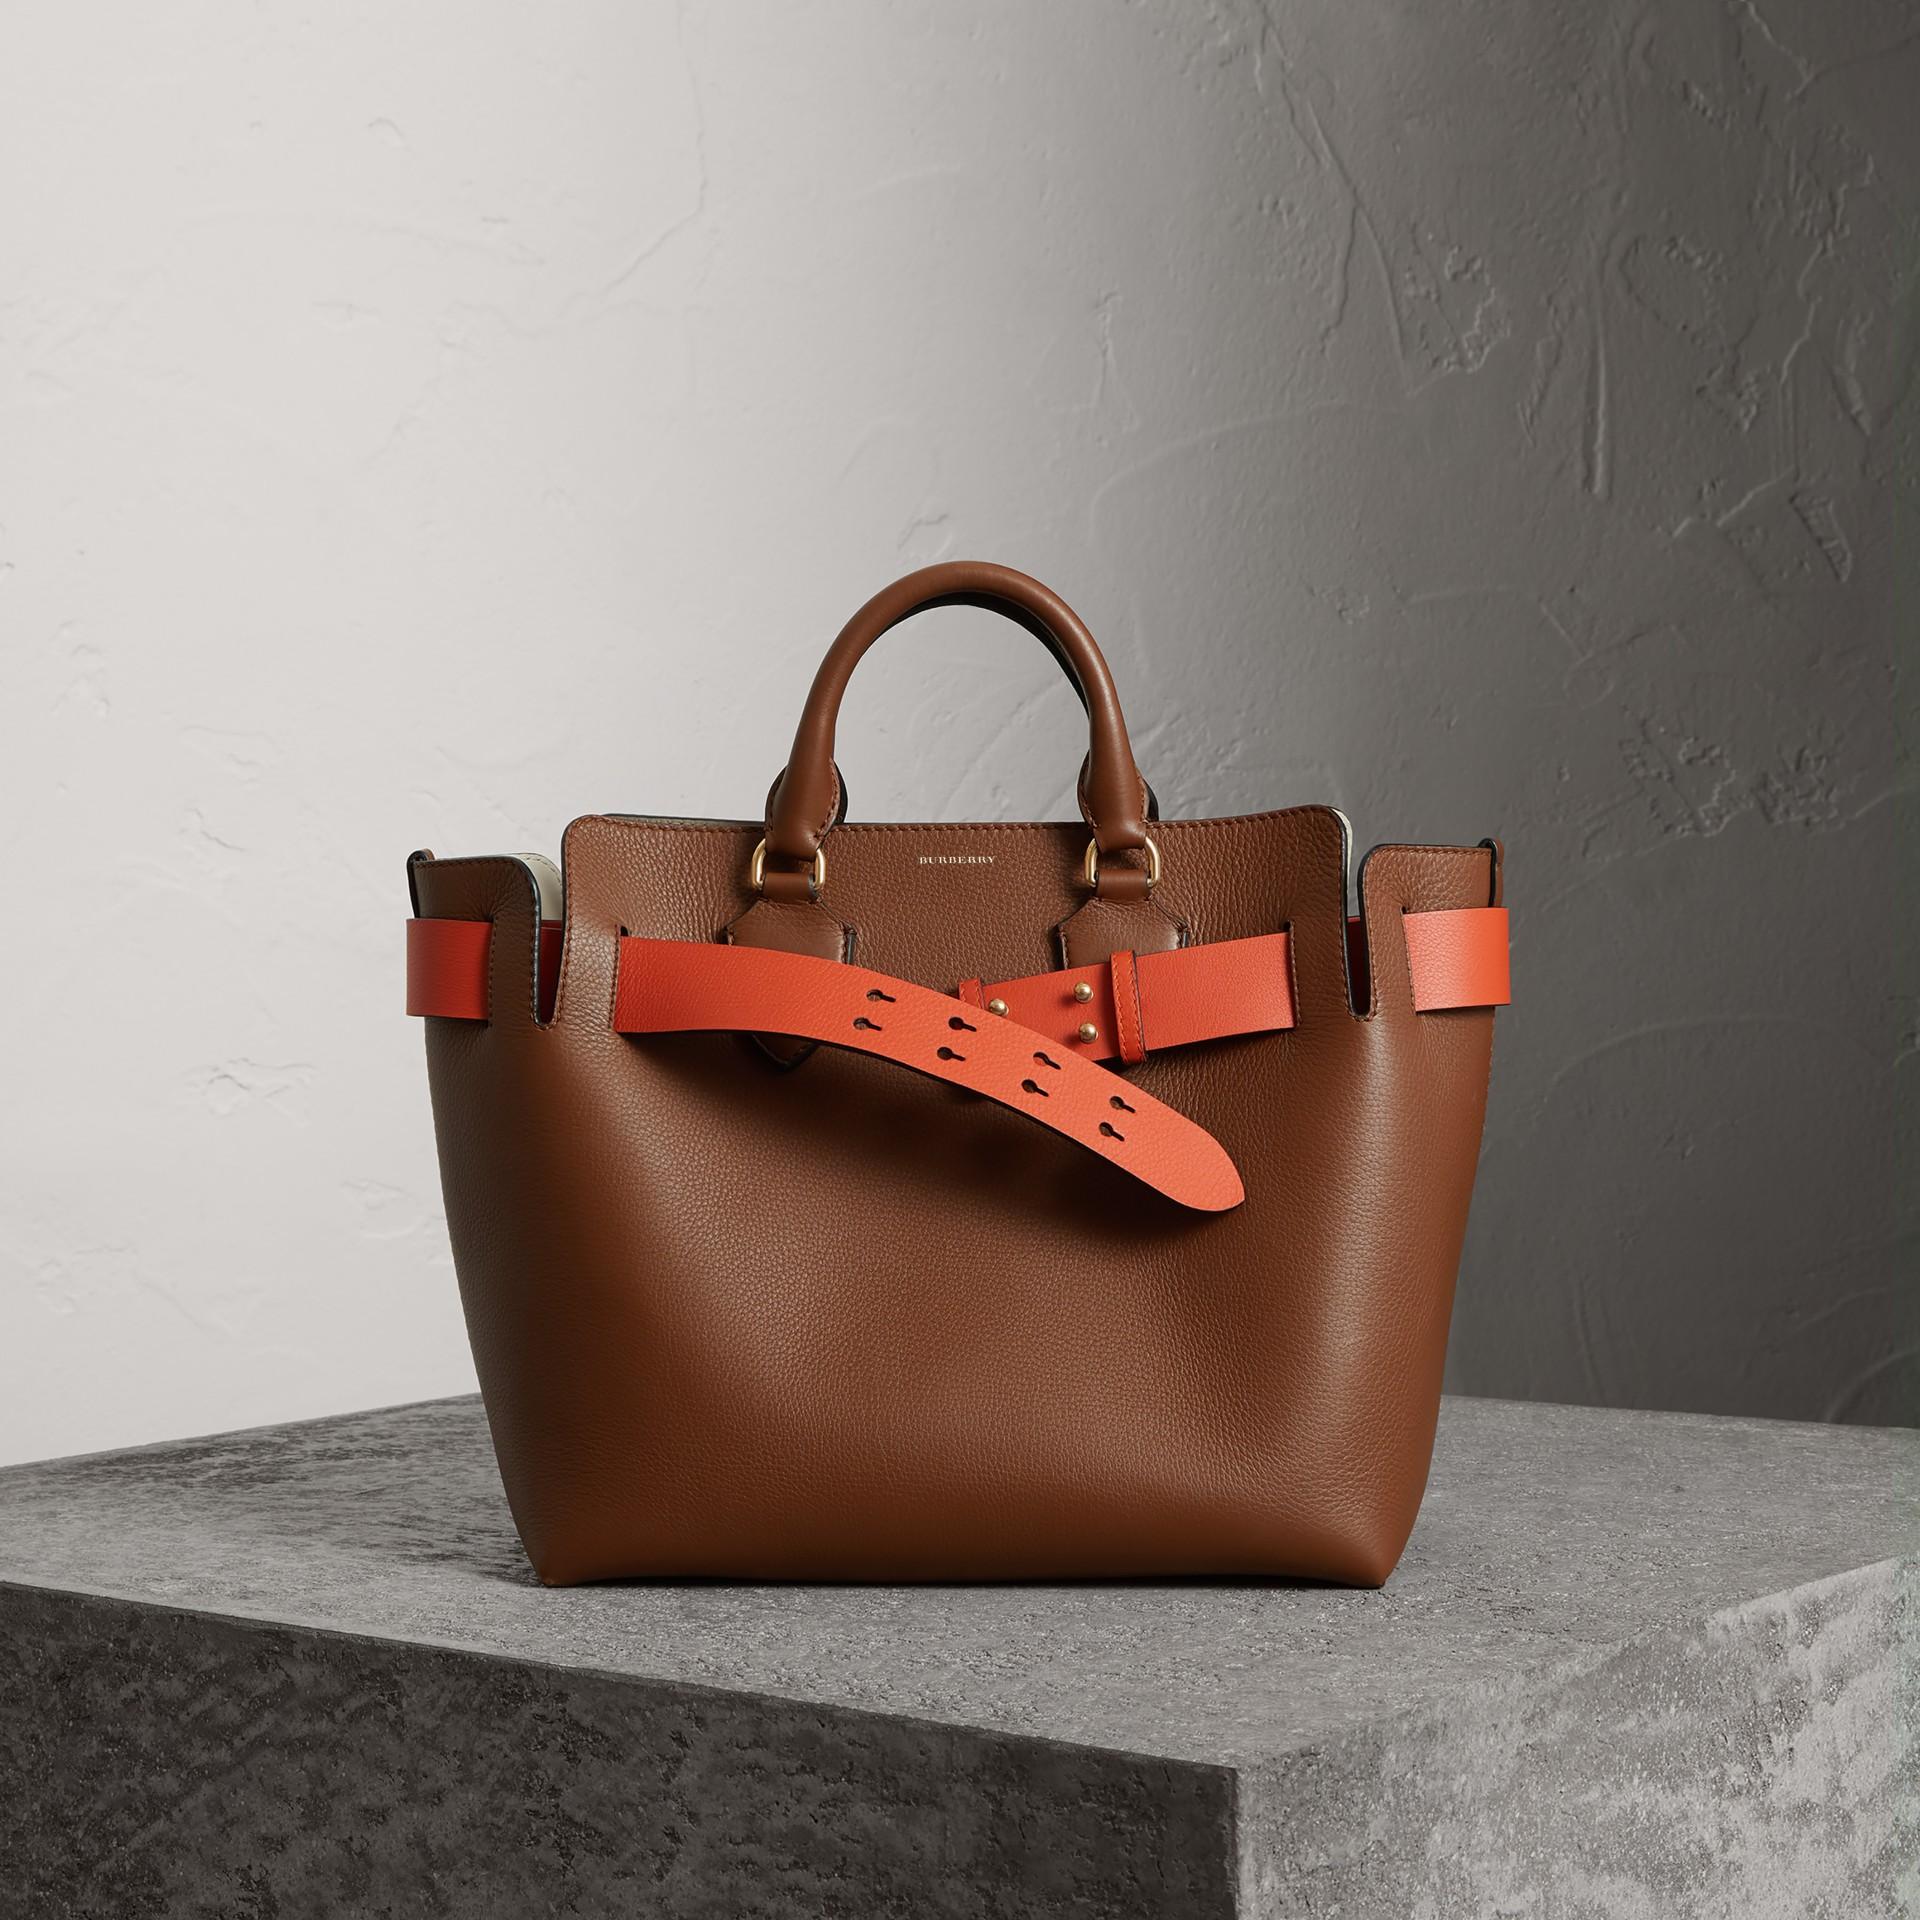 Burberry The Medium Leather Belt Bag In Tan   ModeSens c80a248452